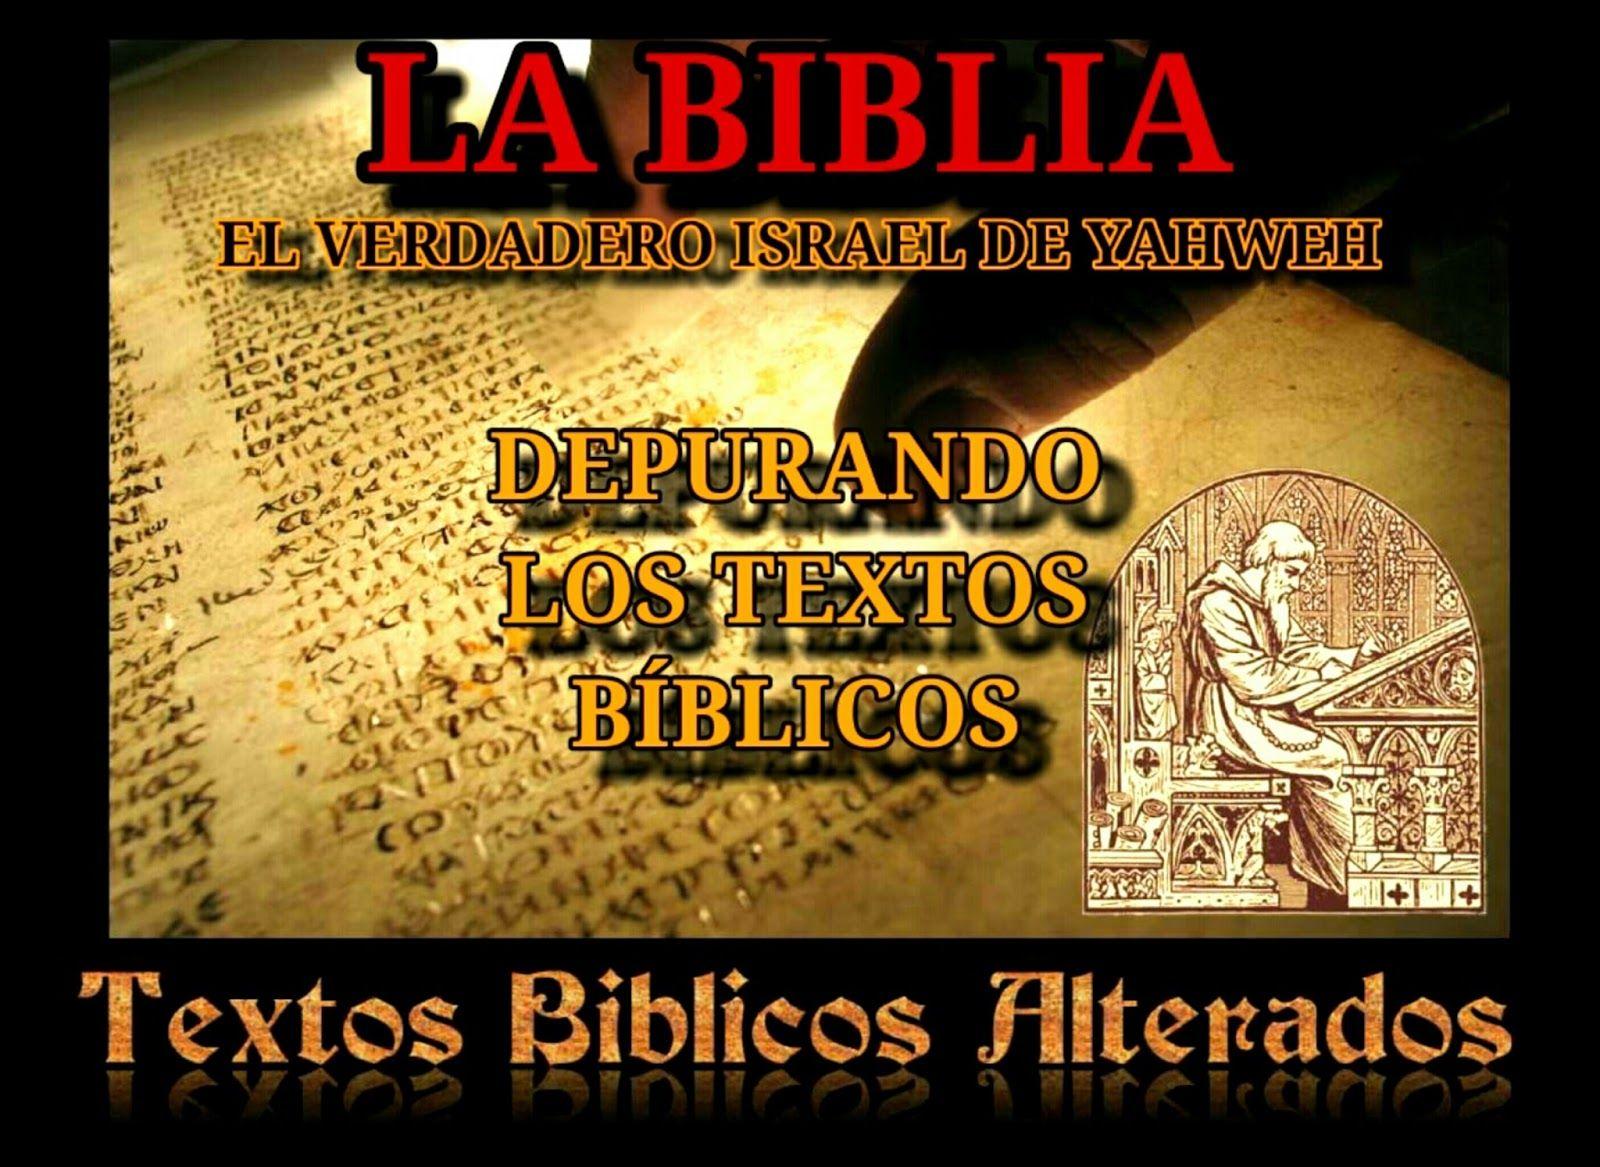 Textos B C3 8dblicos Adulterados Jpg 1 600 1 167 Píxeles Biblia Biblia Cristiana Biblia Hebrea